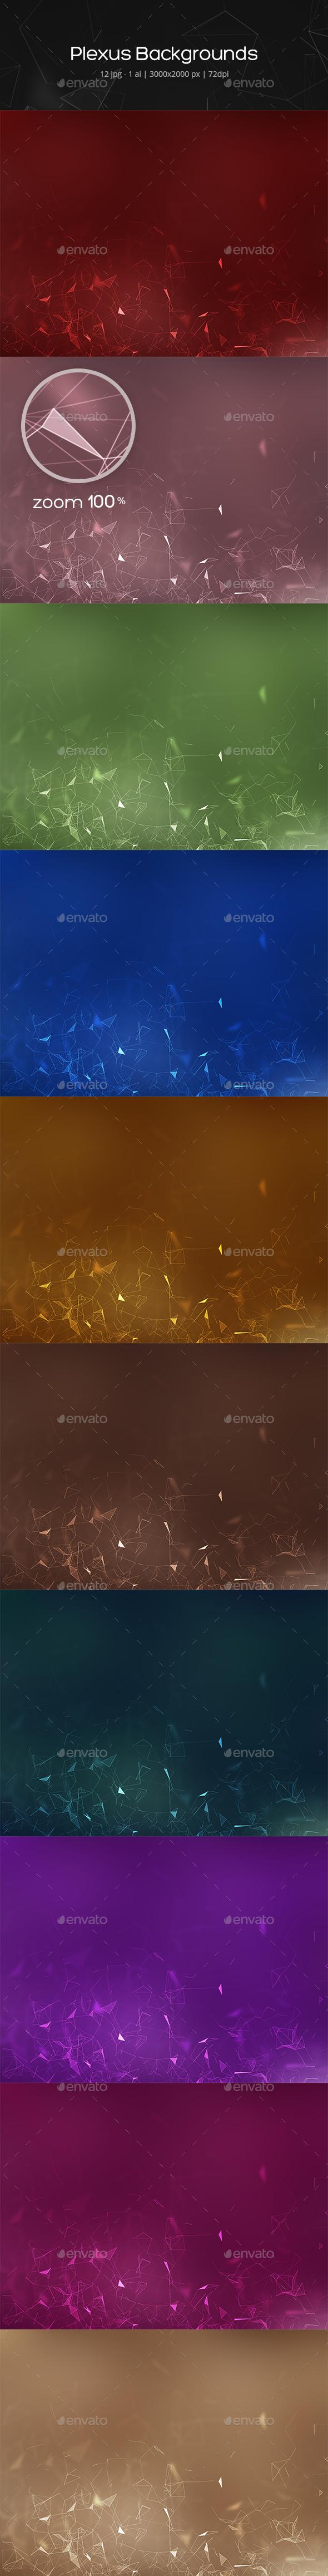 Plexus Backgrounds - Abstract Backgrounds